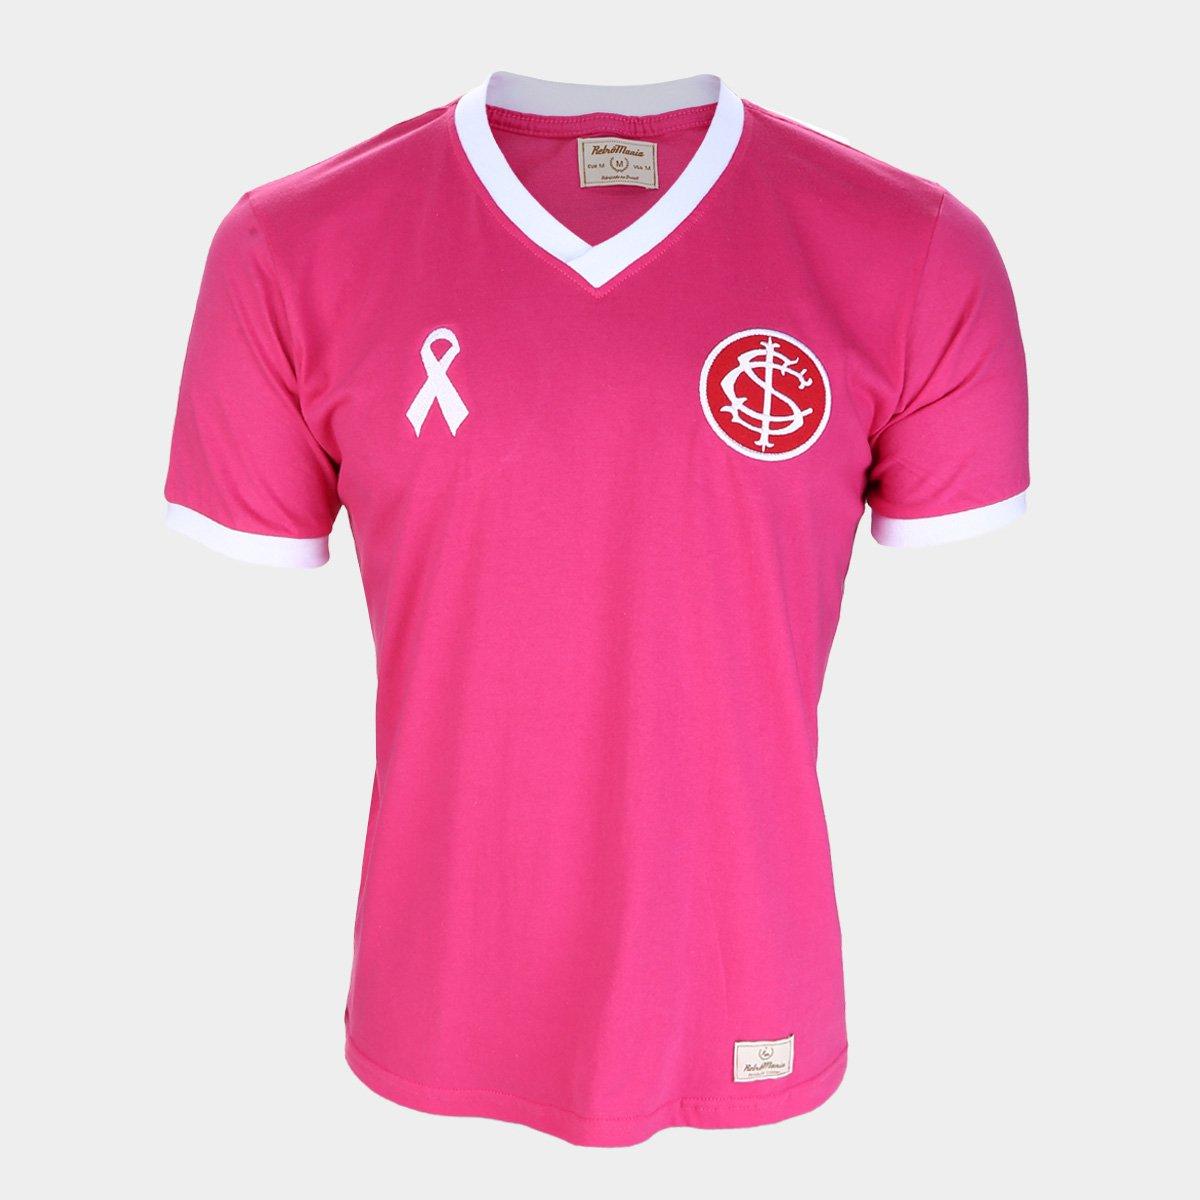 Camisa Internacional Outubro Rosa Retro Mania Masculina Rosa Loja Do Inter